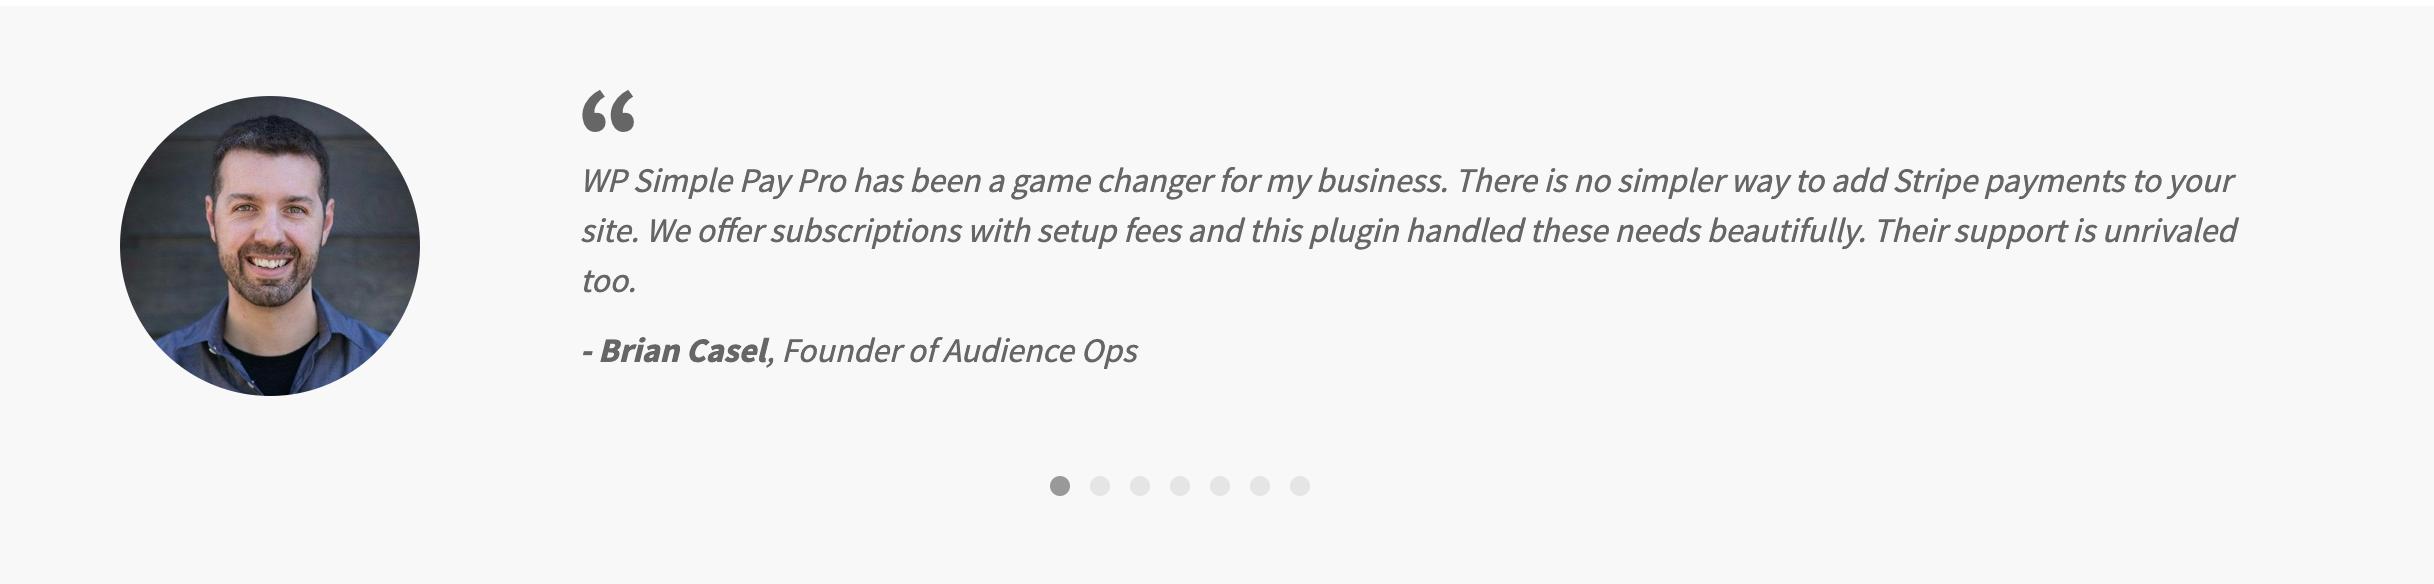 Customer Reviews- WP Simple Pay